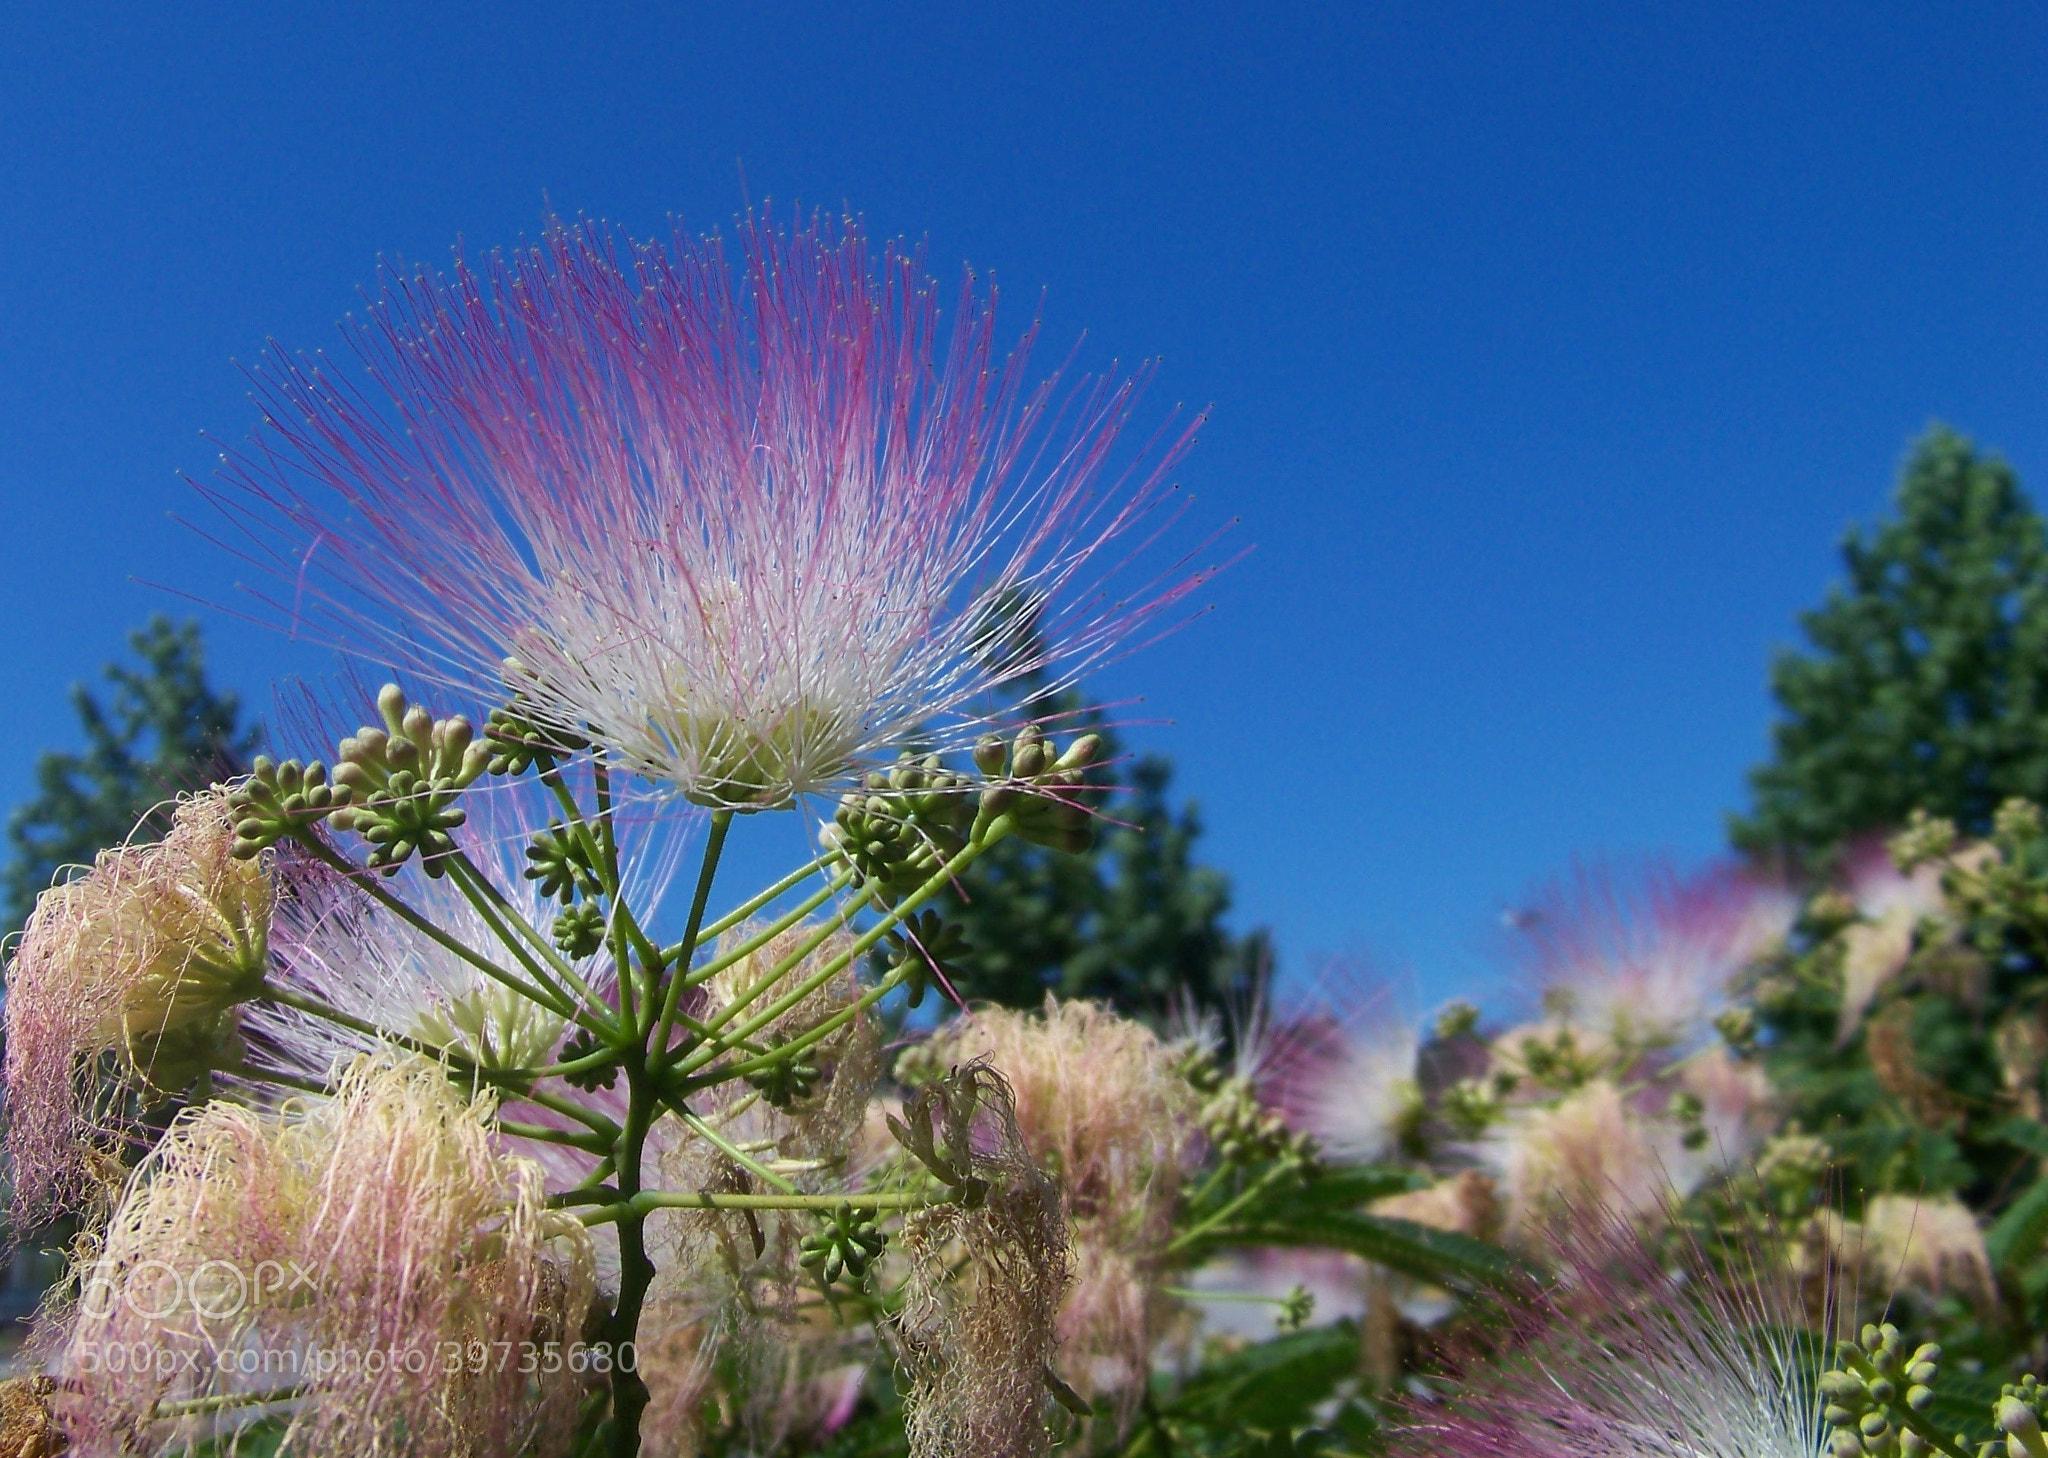 Photograph Flower in heat by Gita Goodwin on 500px